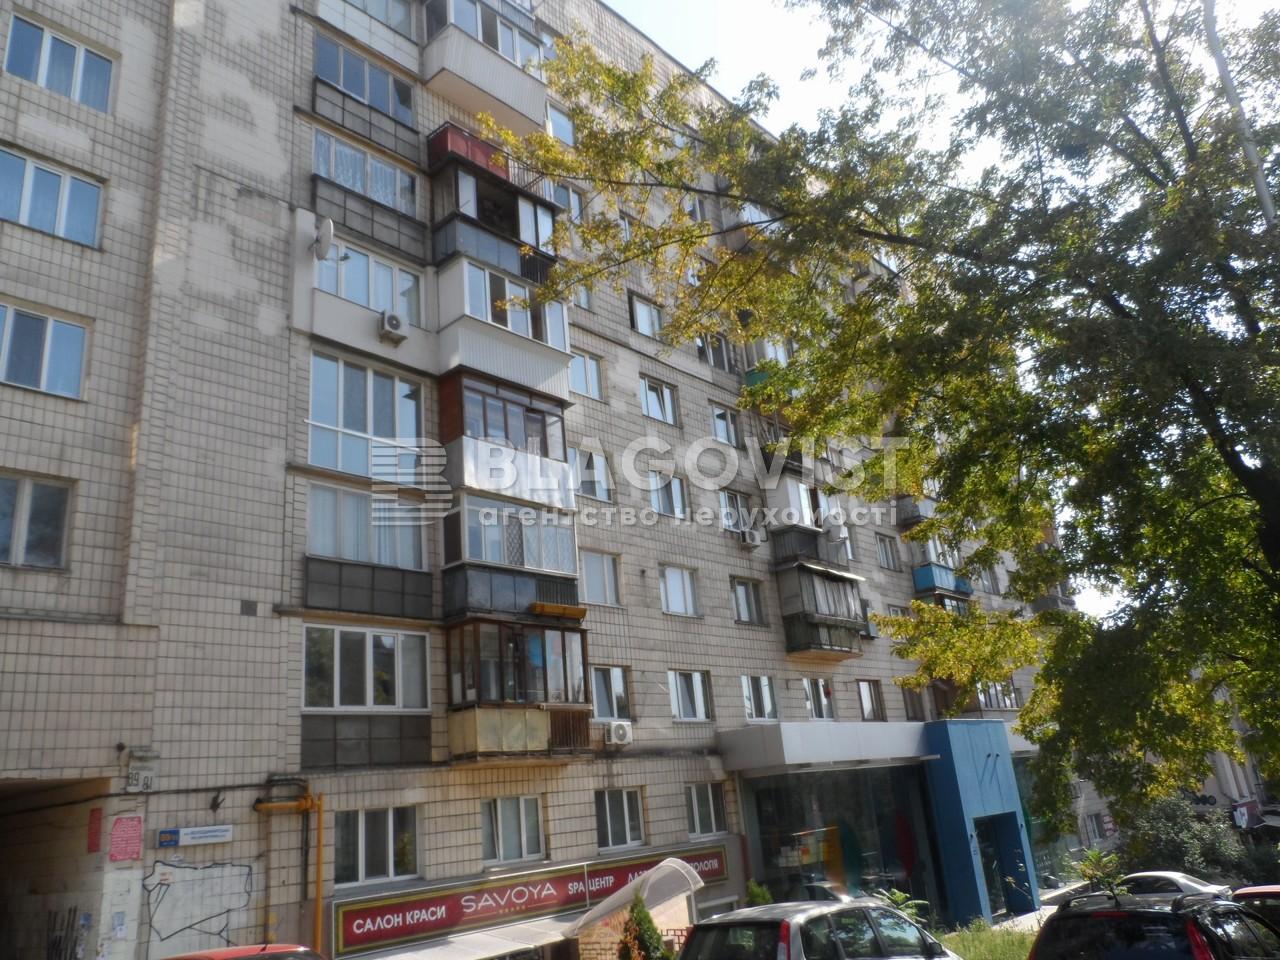 Квартира F-45467, Владимирская, 89/91, Киев - Фото 3